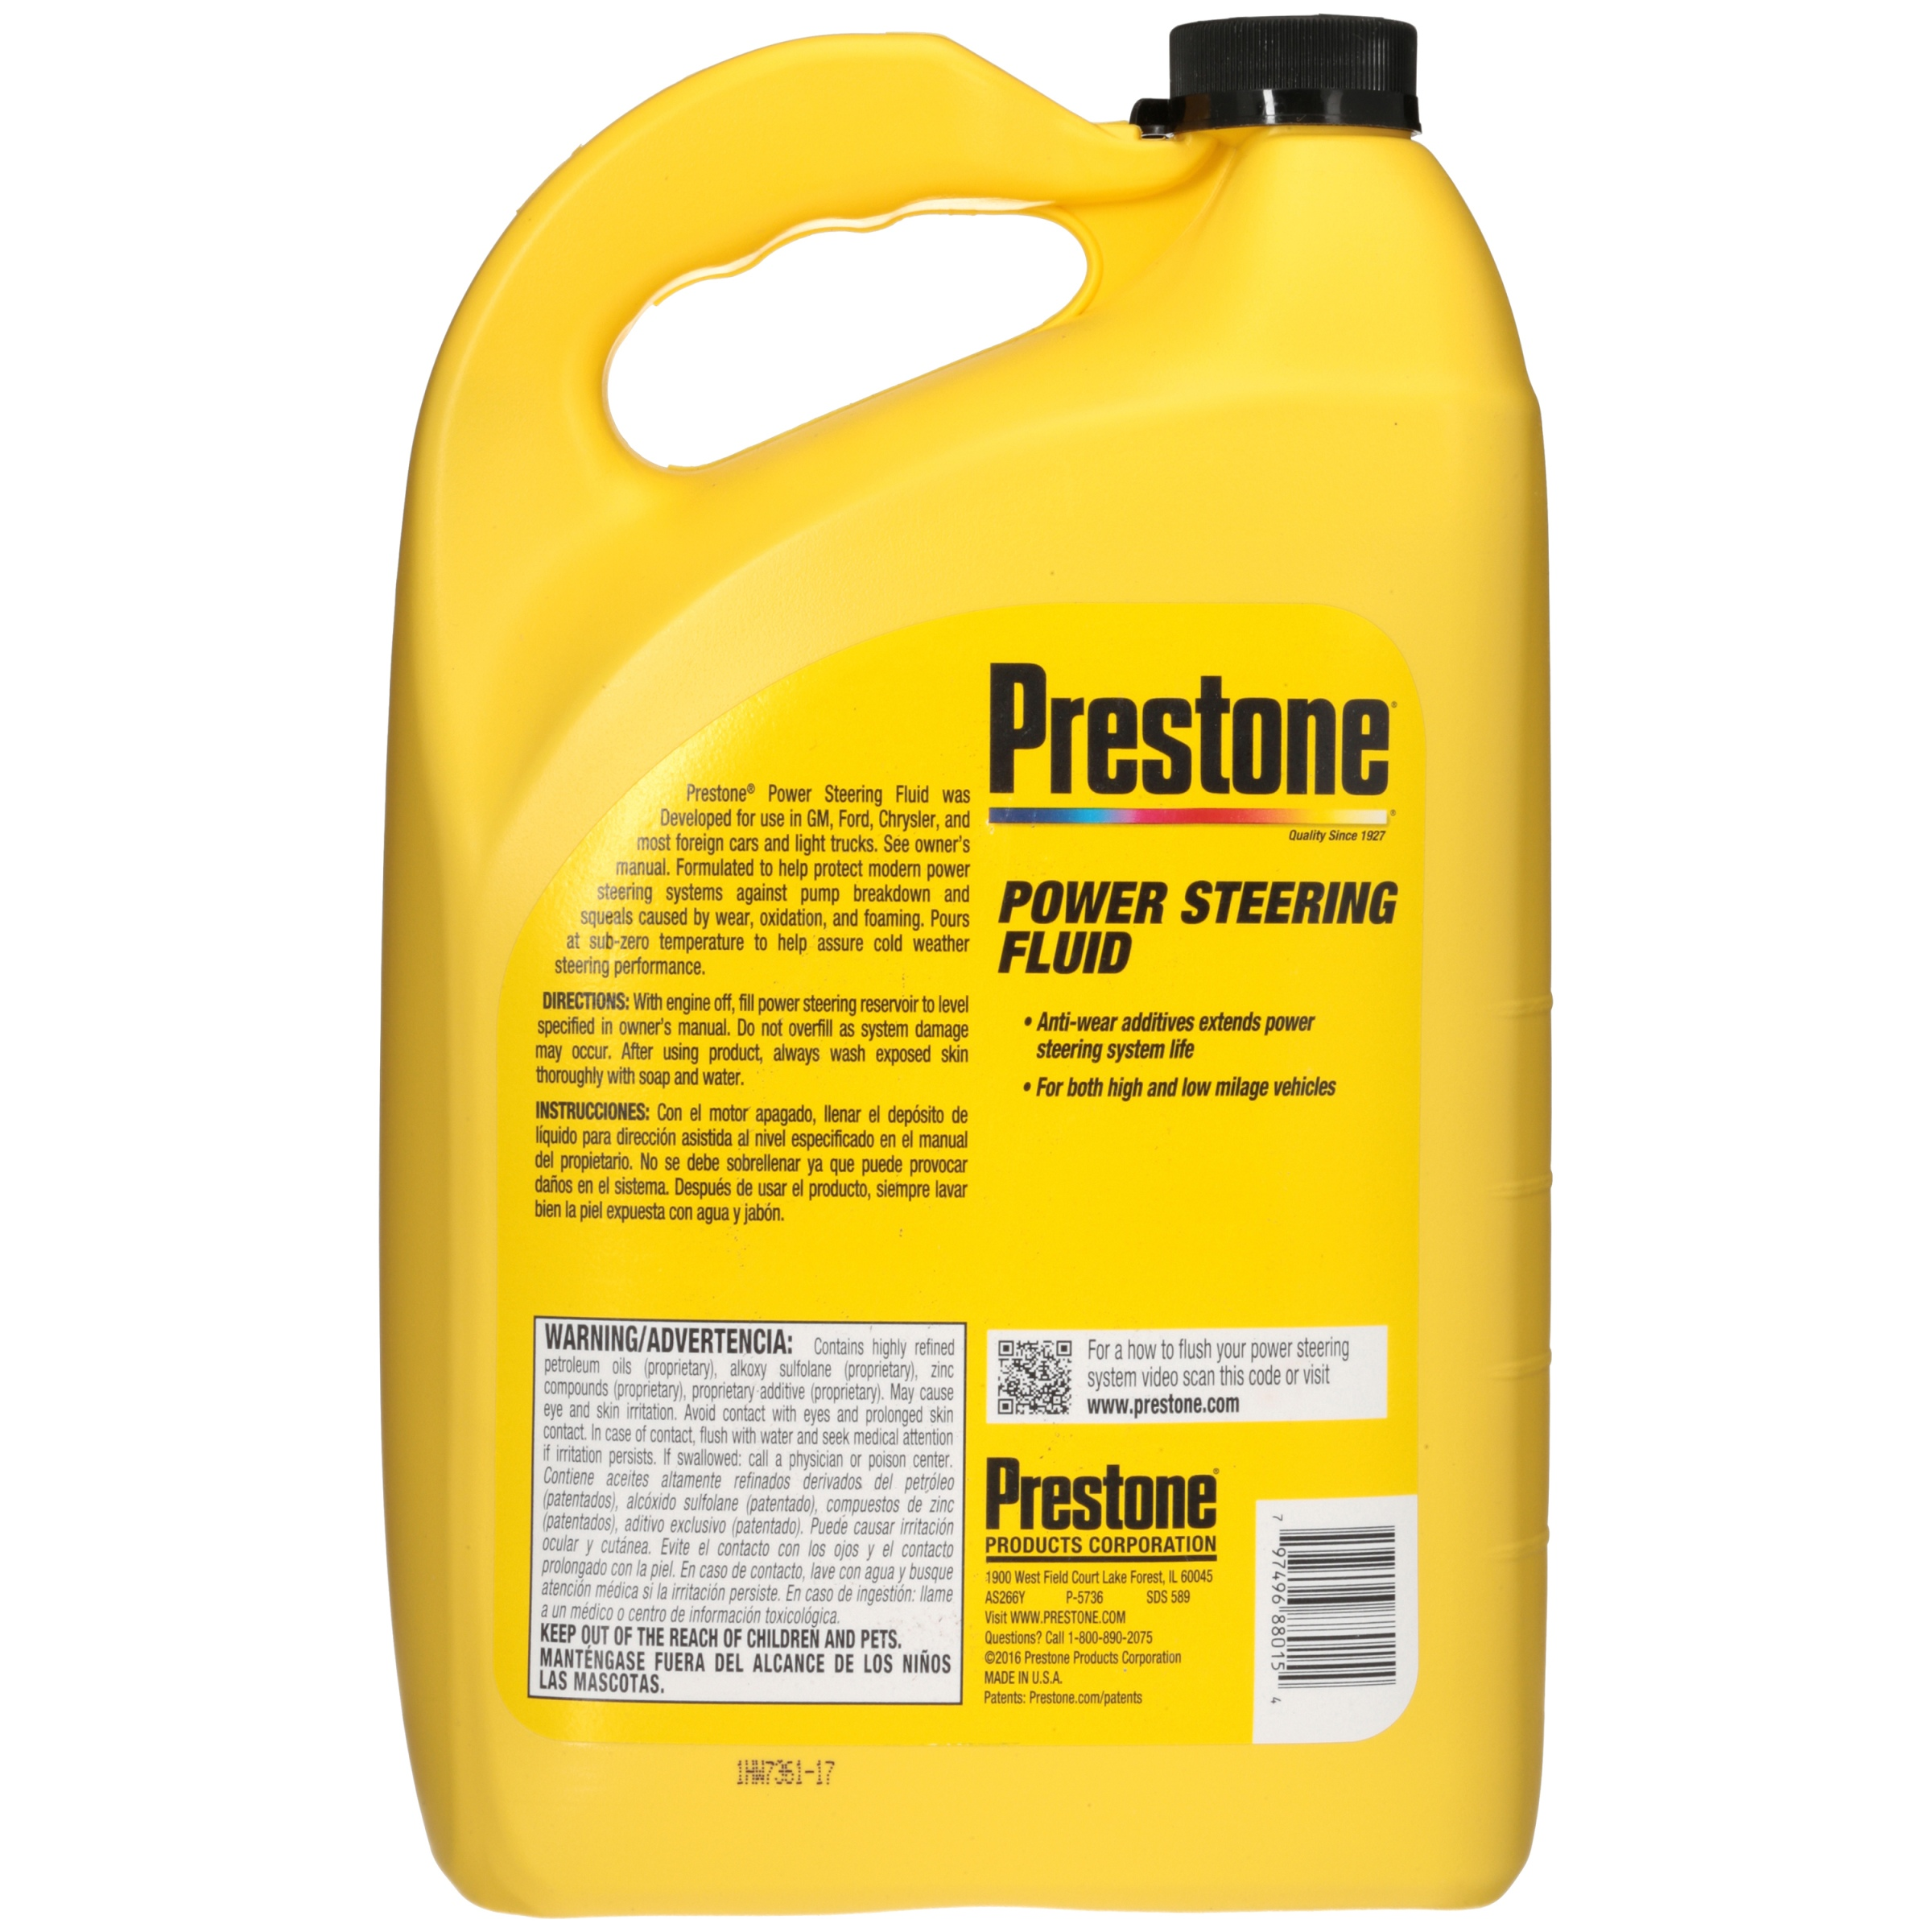 Prestone® Power Steering Fluid 1 gal  Jug - Walmart com